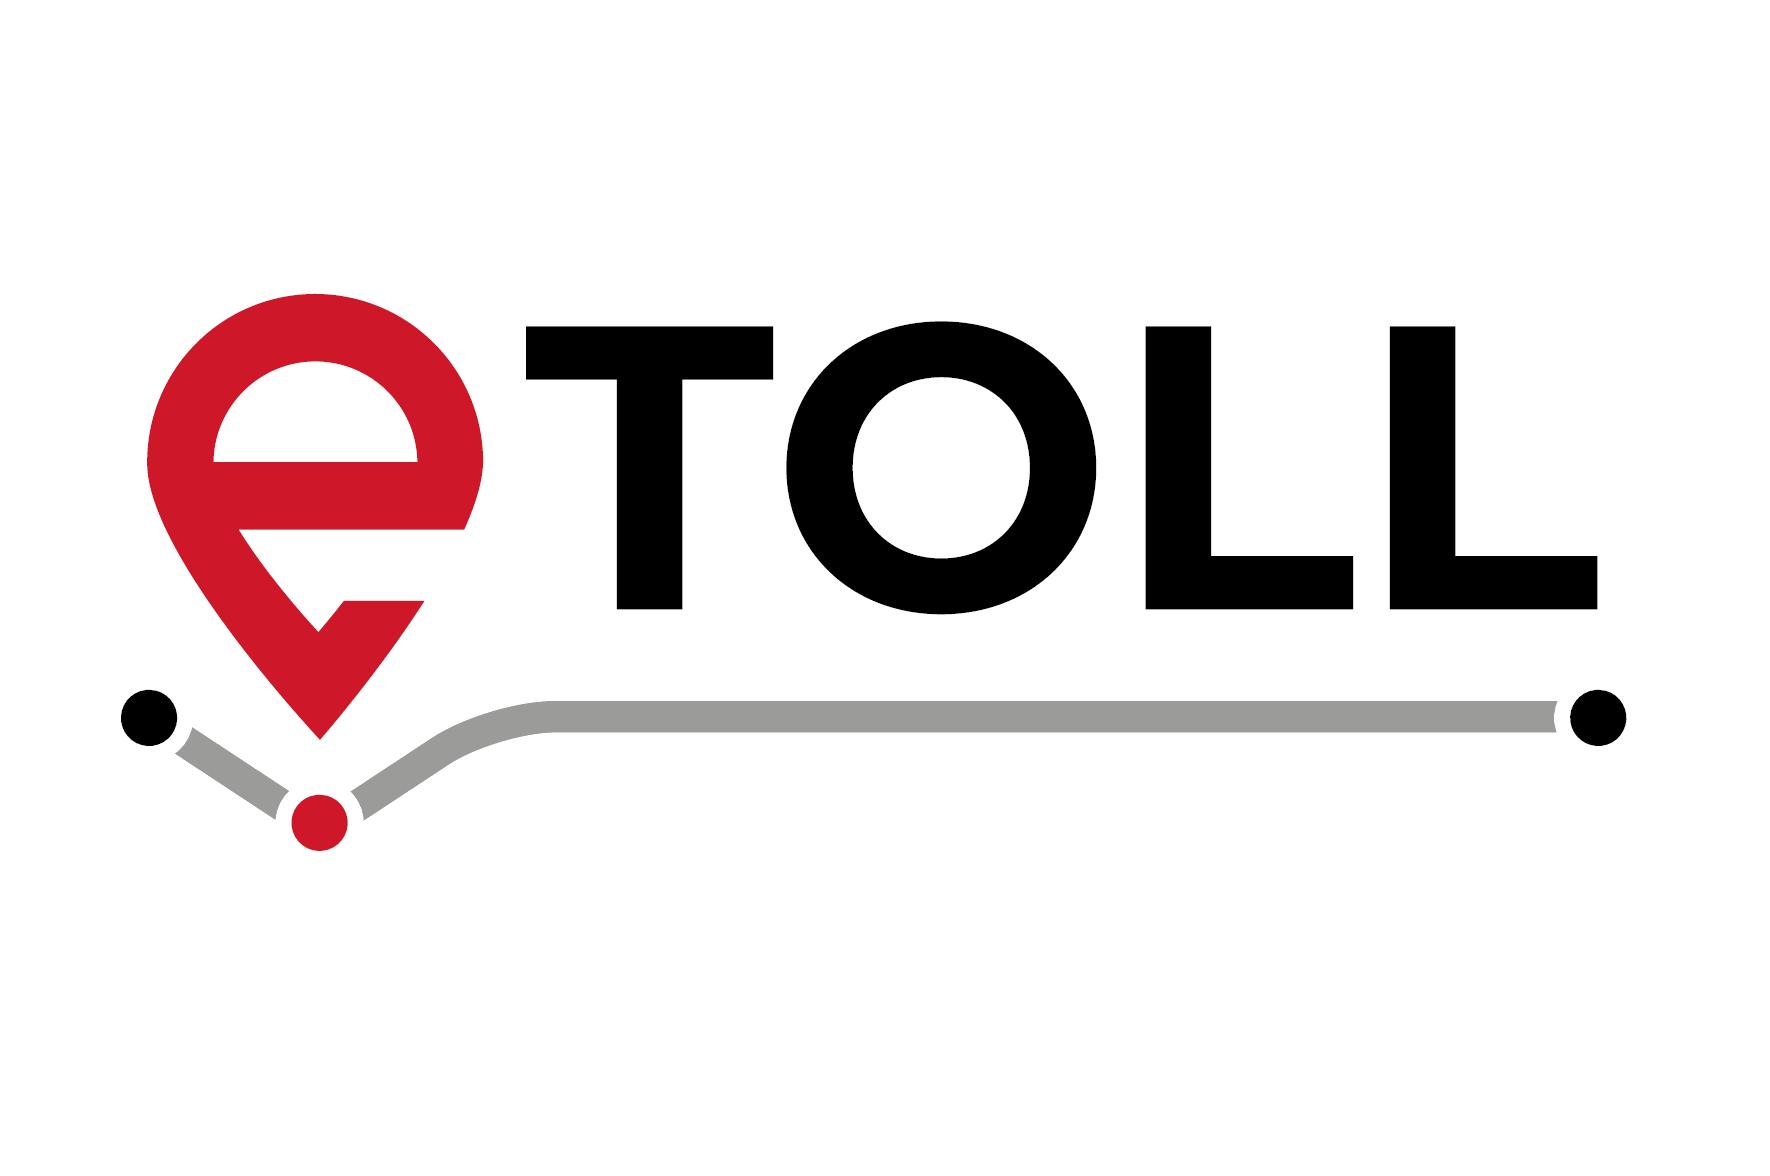 Nowa aplikacja e-TOLL PL  już online! » IKOL.pl  system poboru opłat